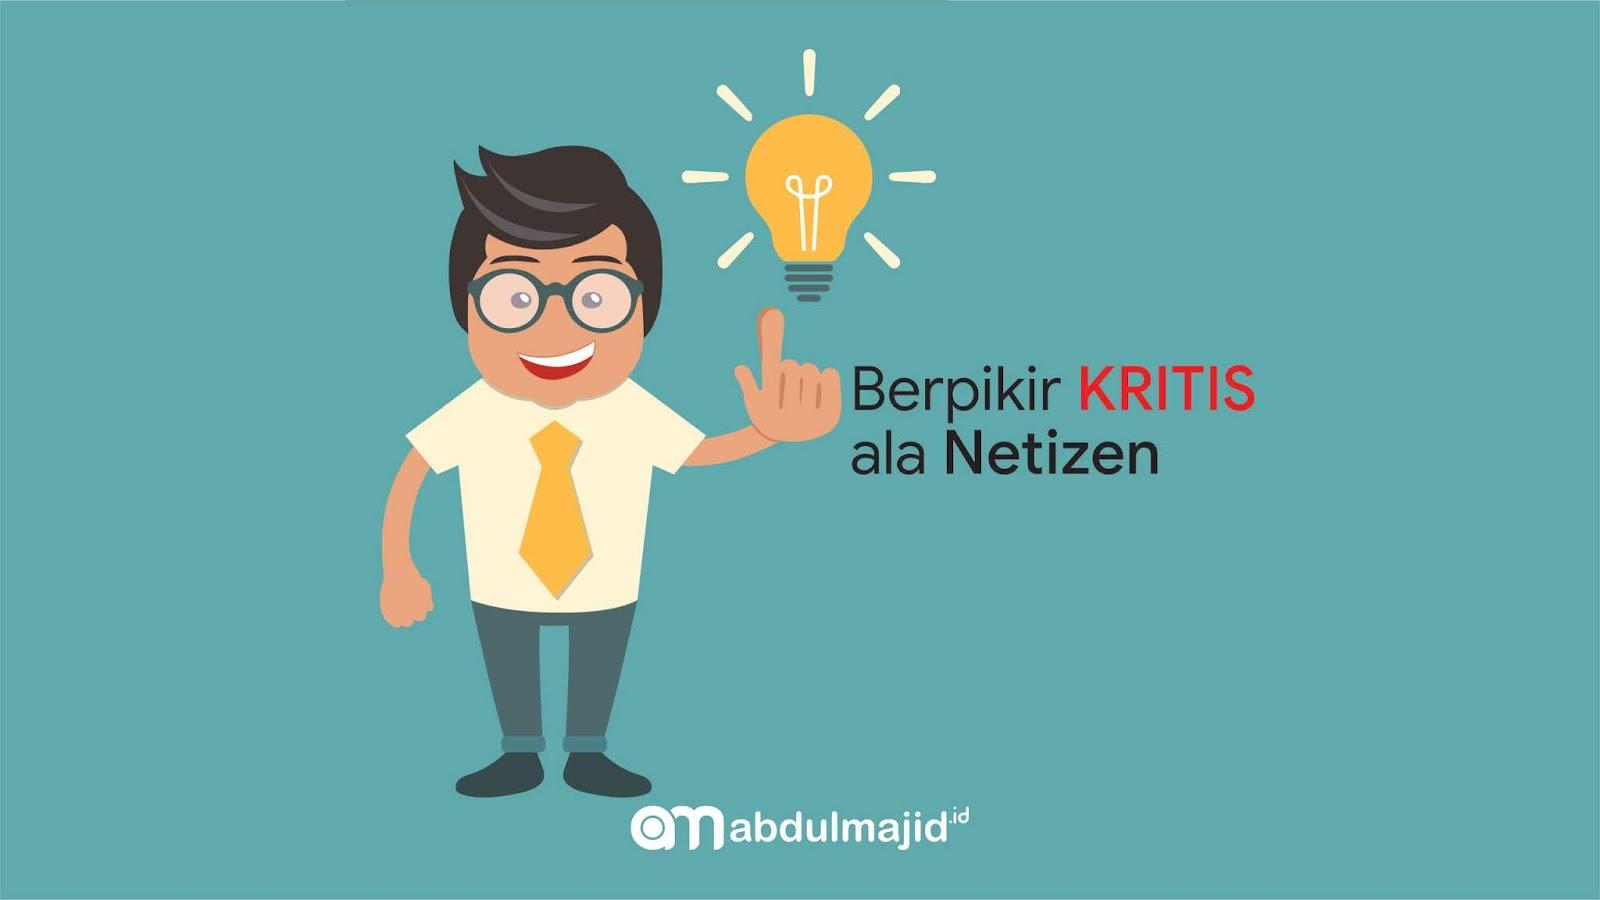 berpikir-kritis-ala-netizen